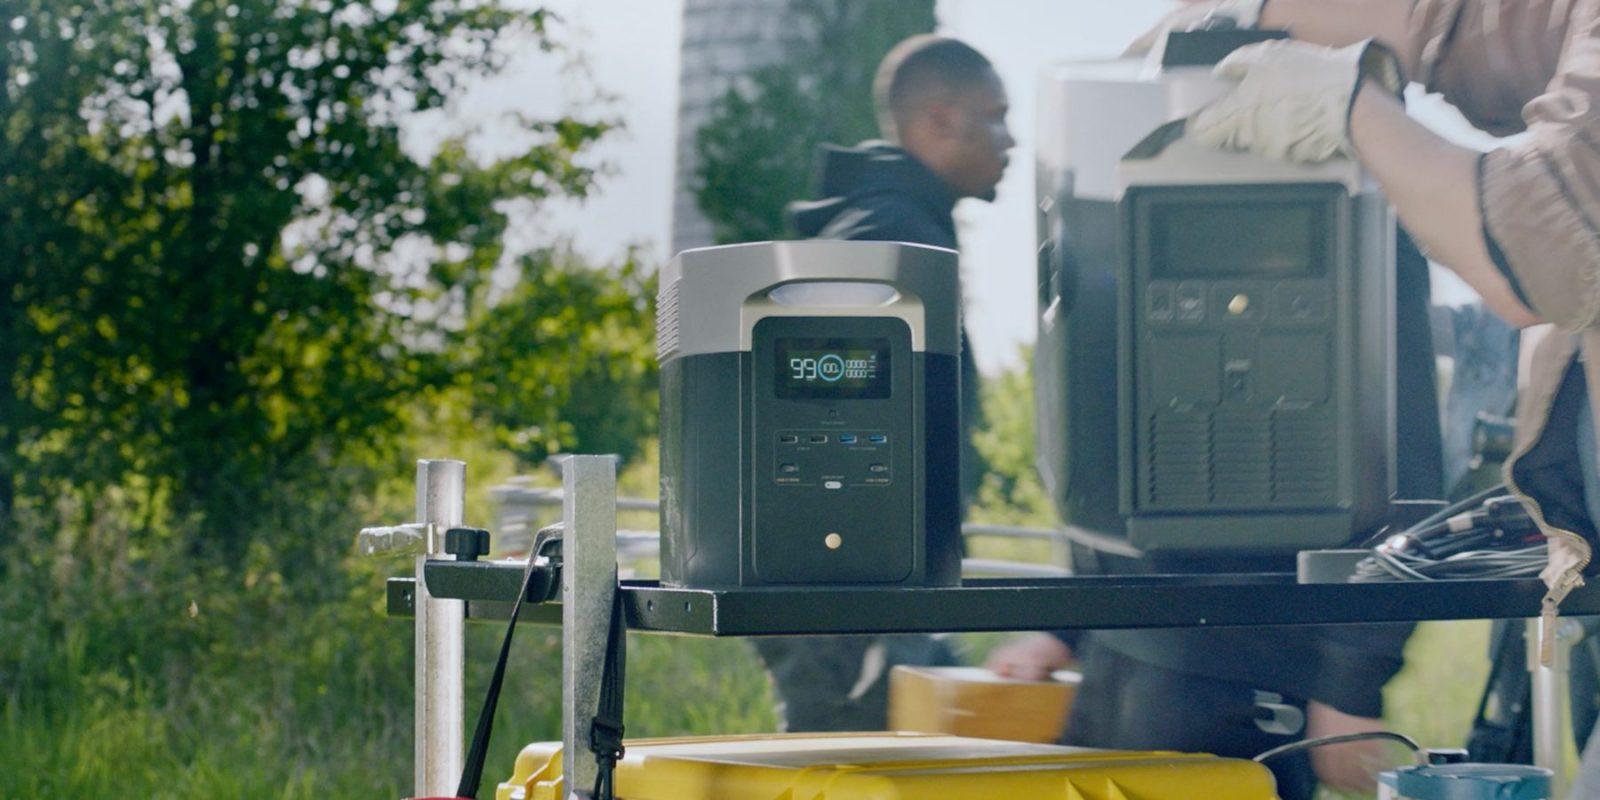 EcoFlow Delta Max Smart Generator